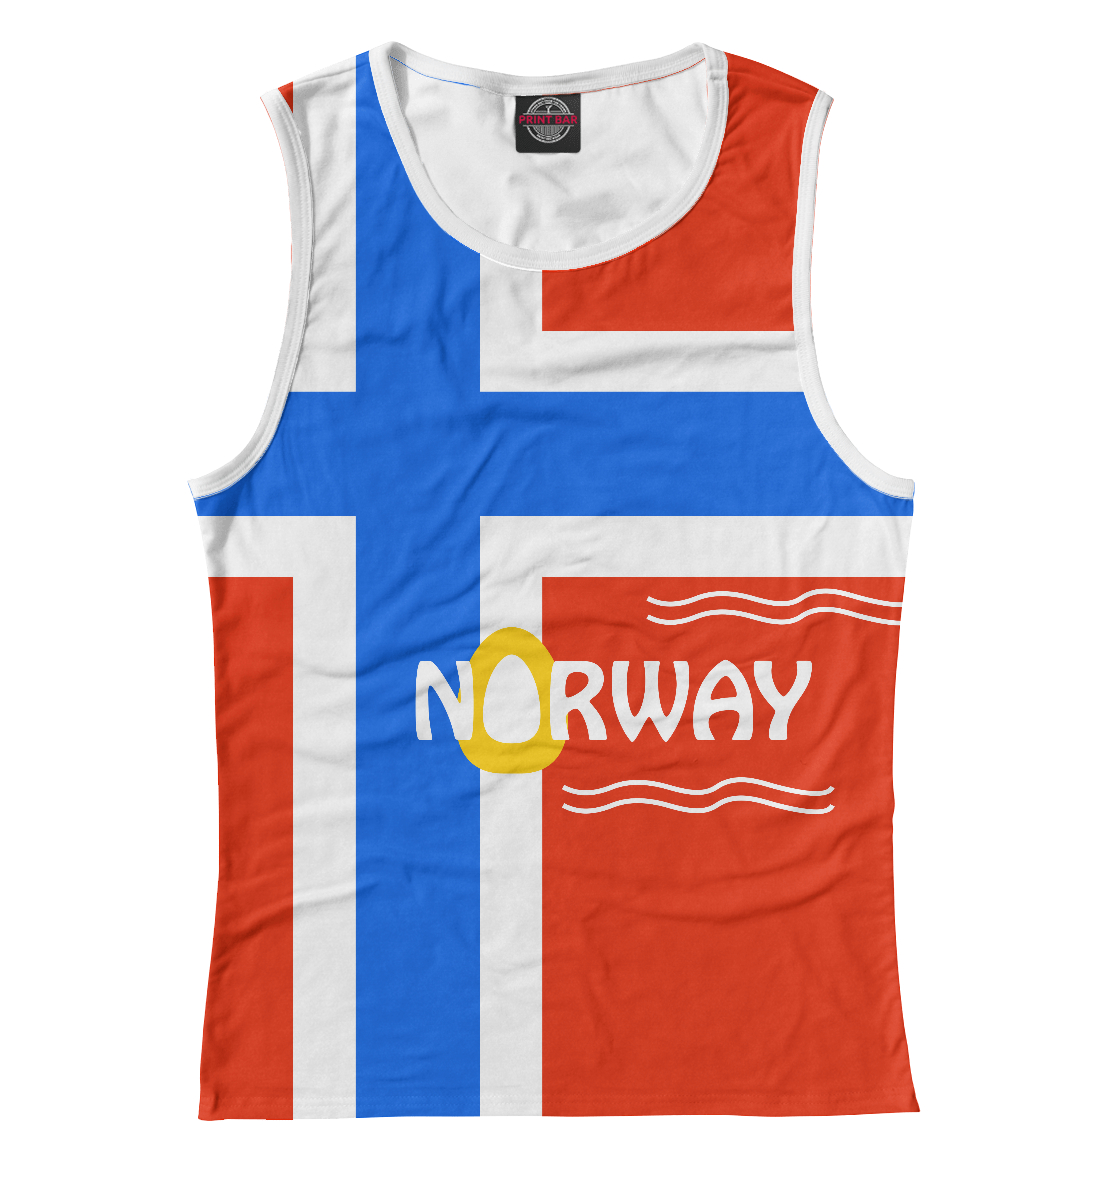 Купить Норвегия, Printbar, Майки, CTS-292150-may-1